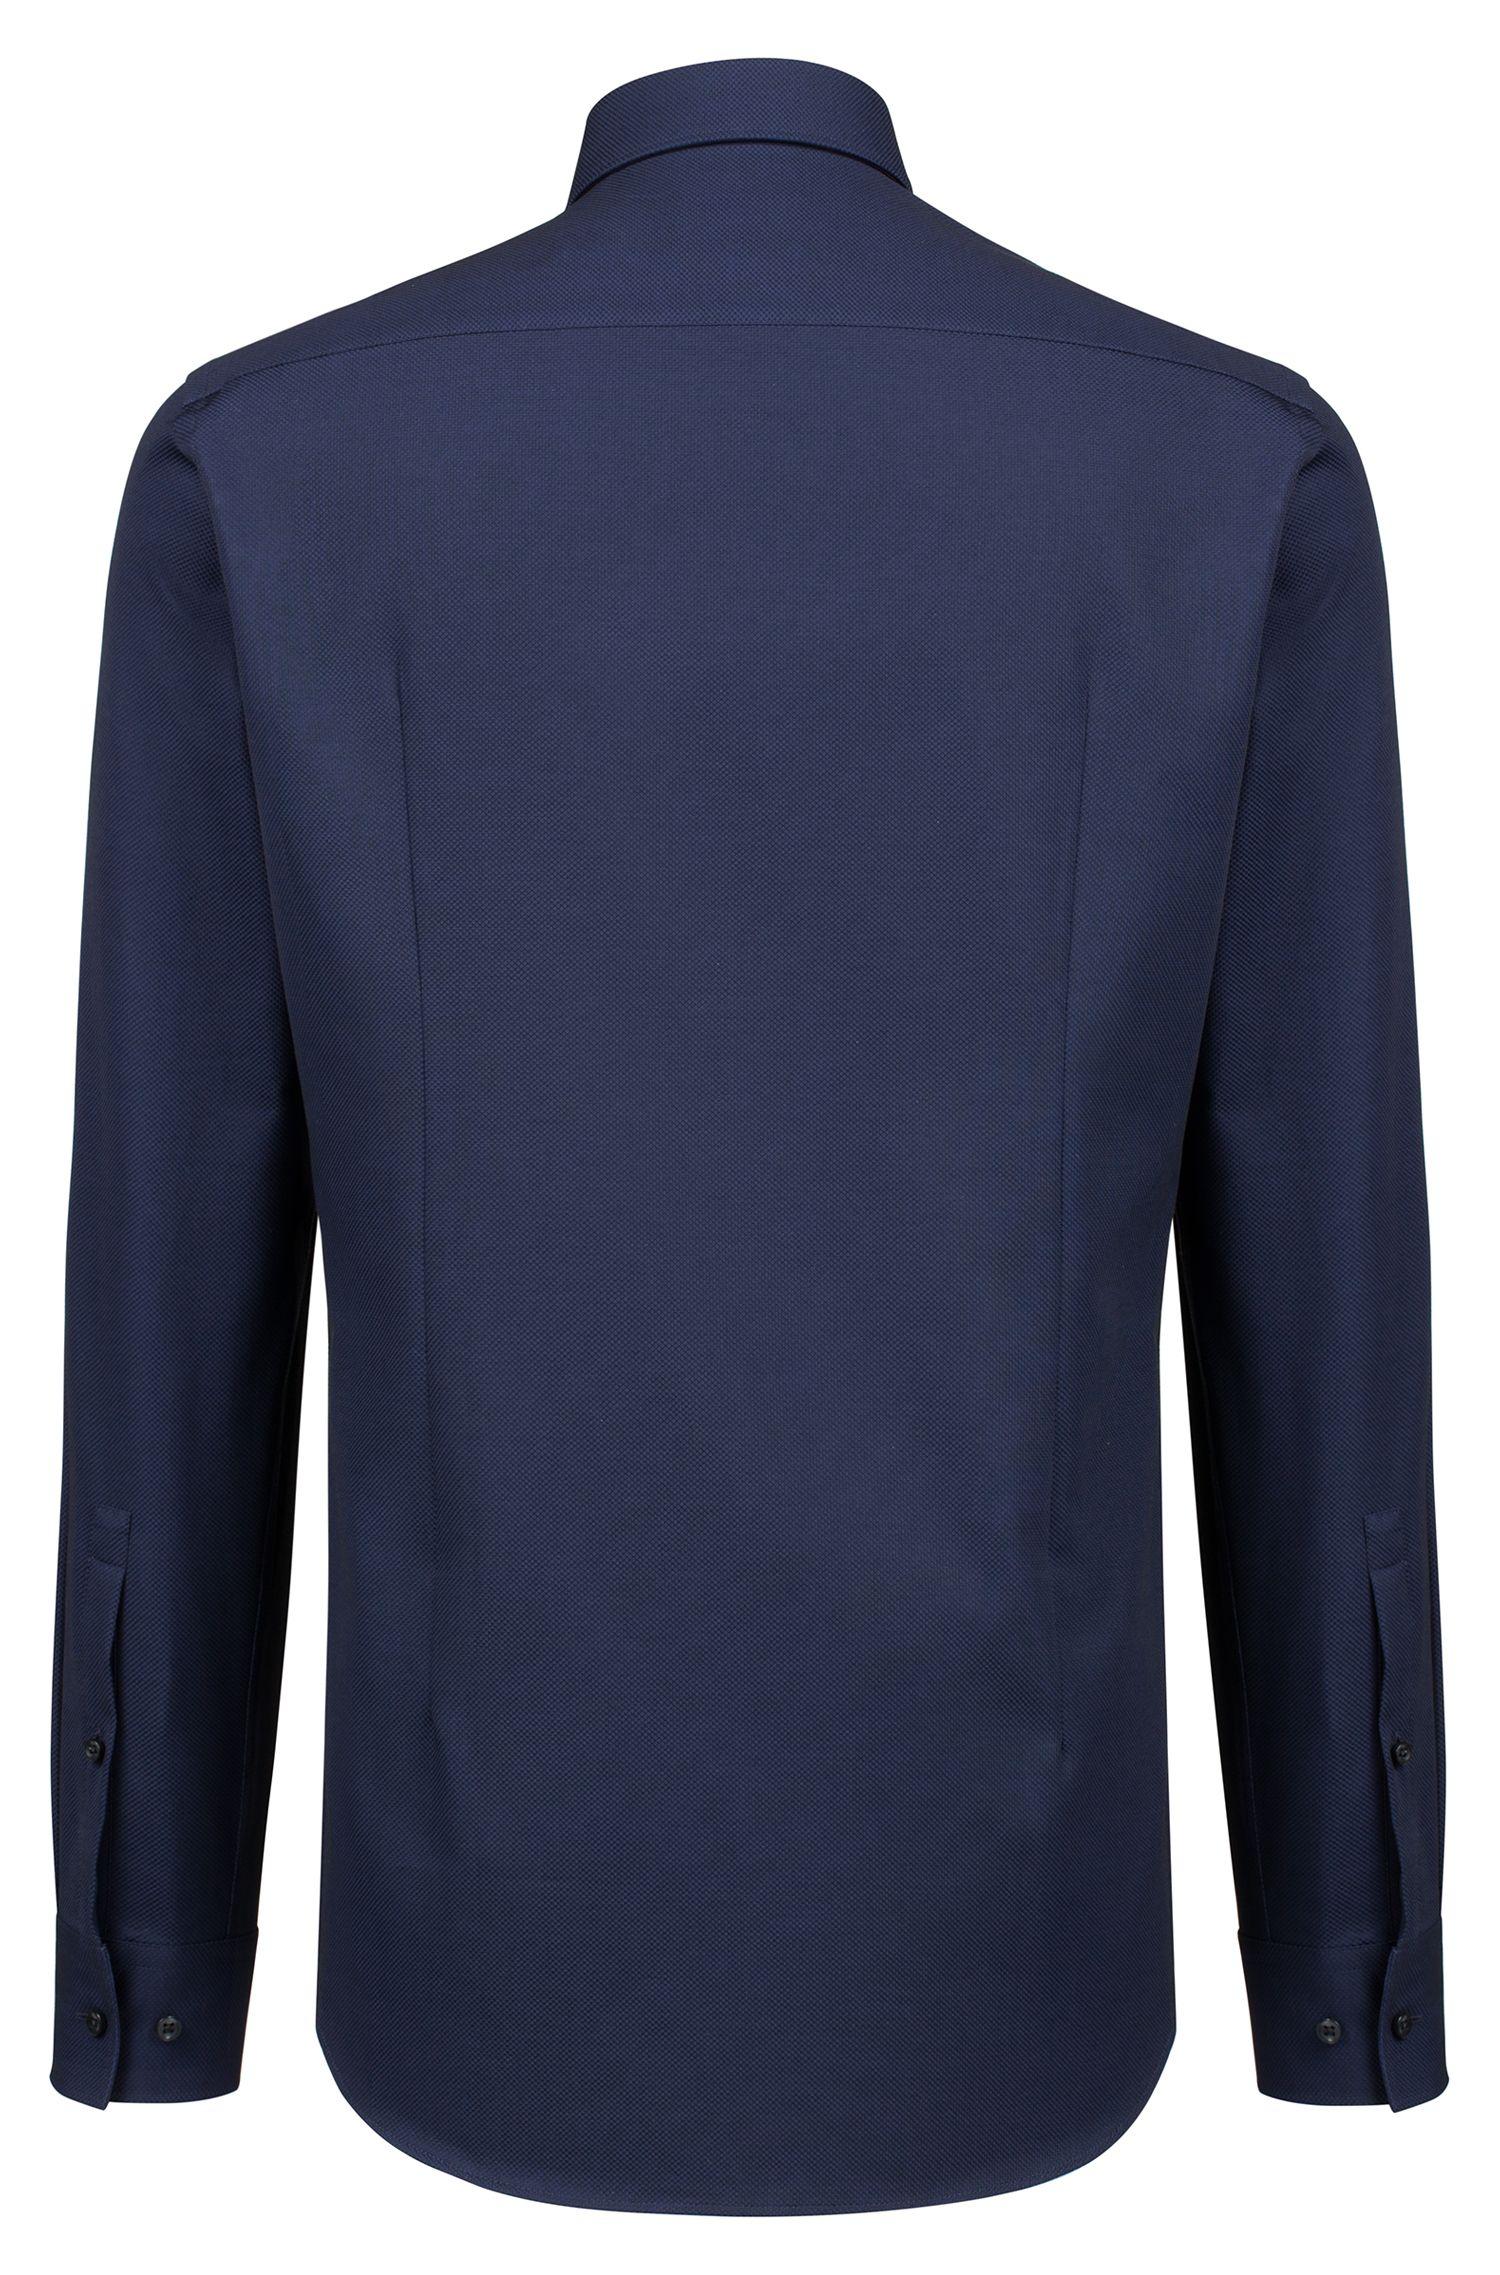 Slim-fit overhemd van katoen met gespreide kraag, Donkerblauw